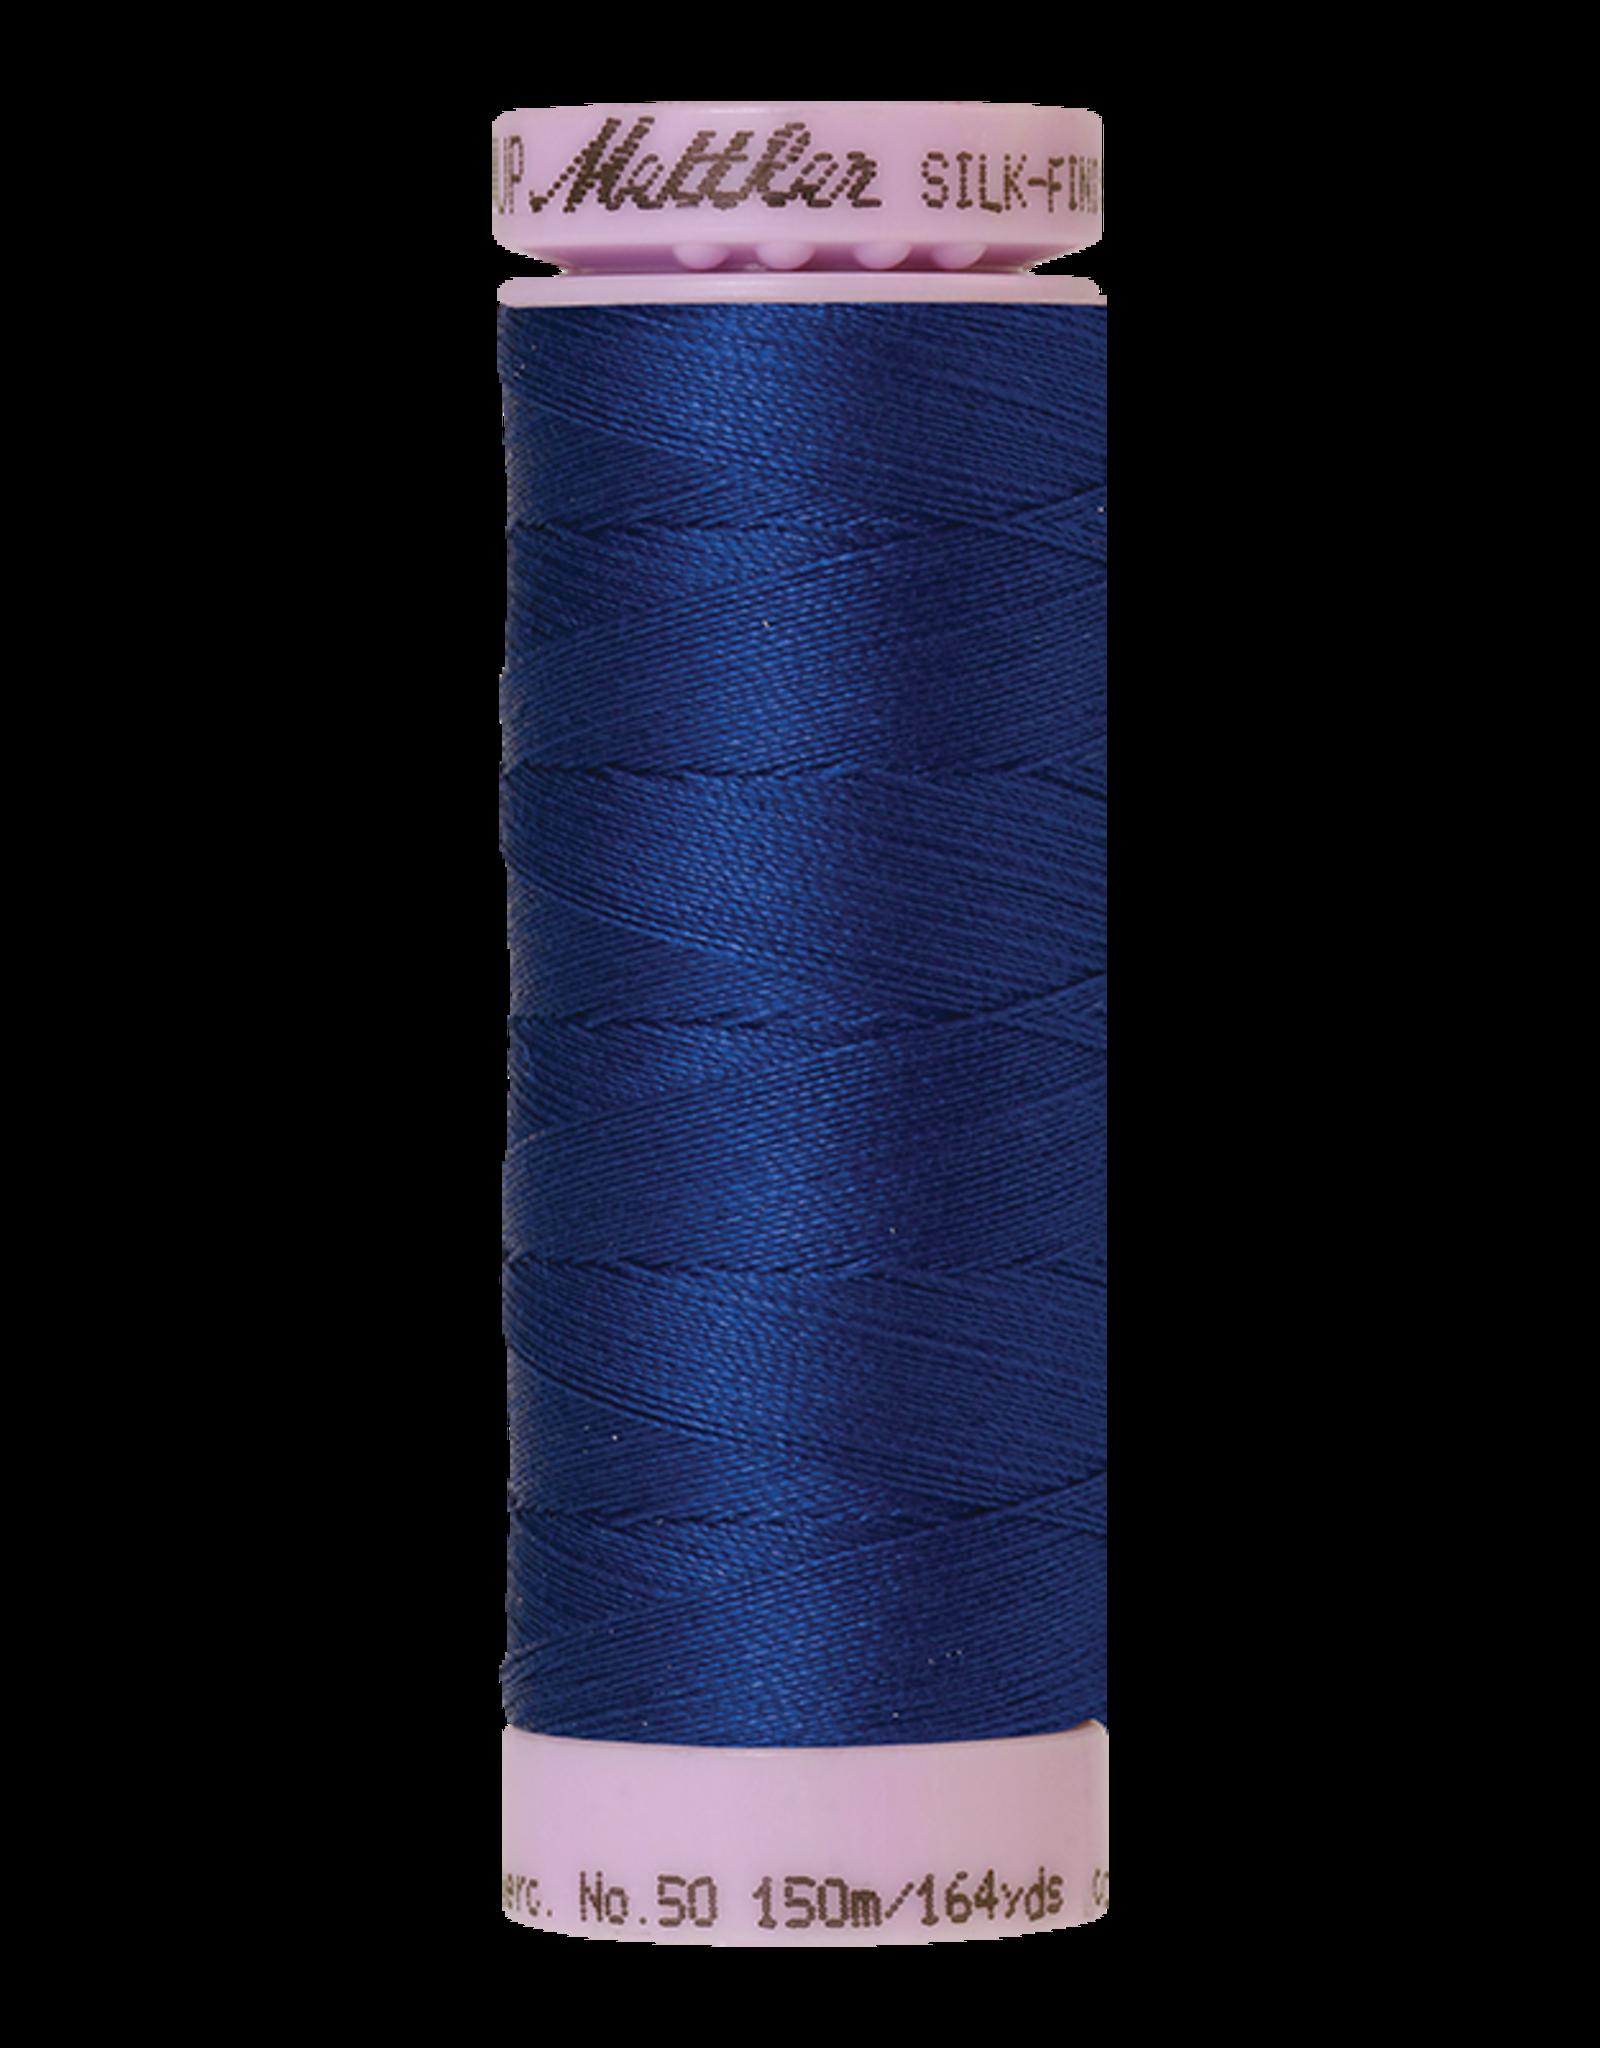 Mettler Silk Finish Cotton 50 - 150 meter - 1304